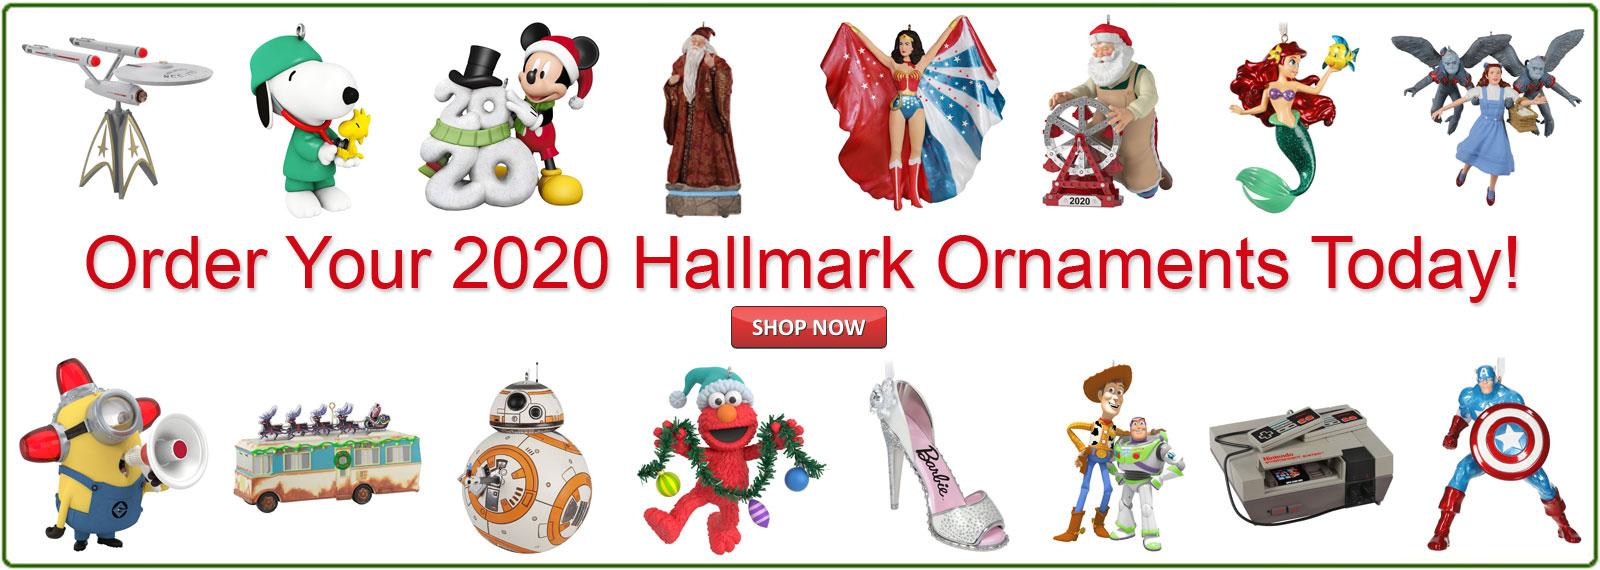 Hallmark Christmas Ornaments 2020 Buy Hallmark Keepsake Ornaments | Ornament Factory